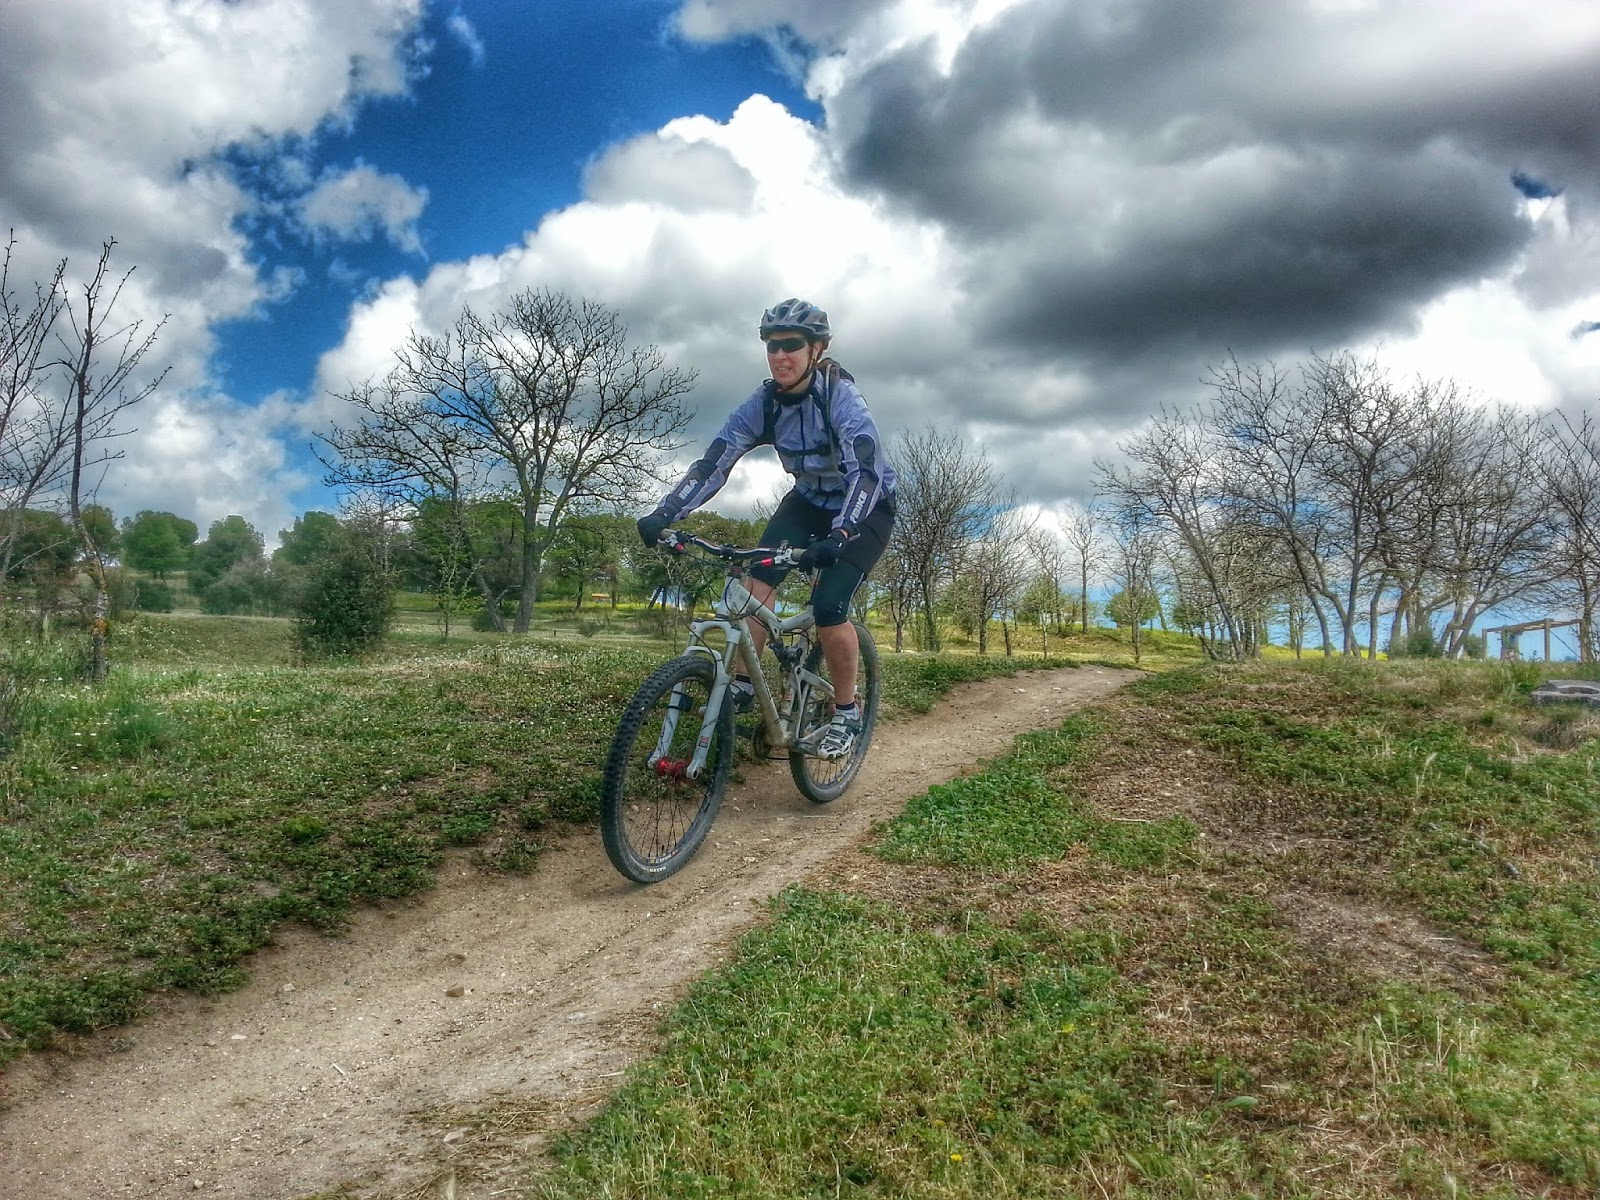 Mejores Bicicletas De Montaña Para Mujer 【2021